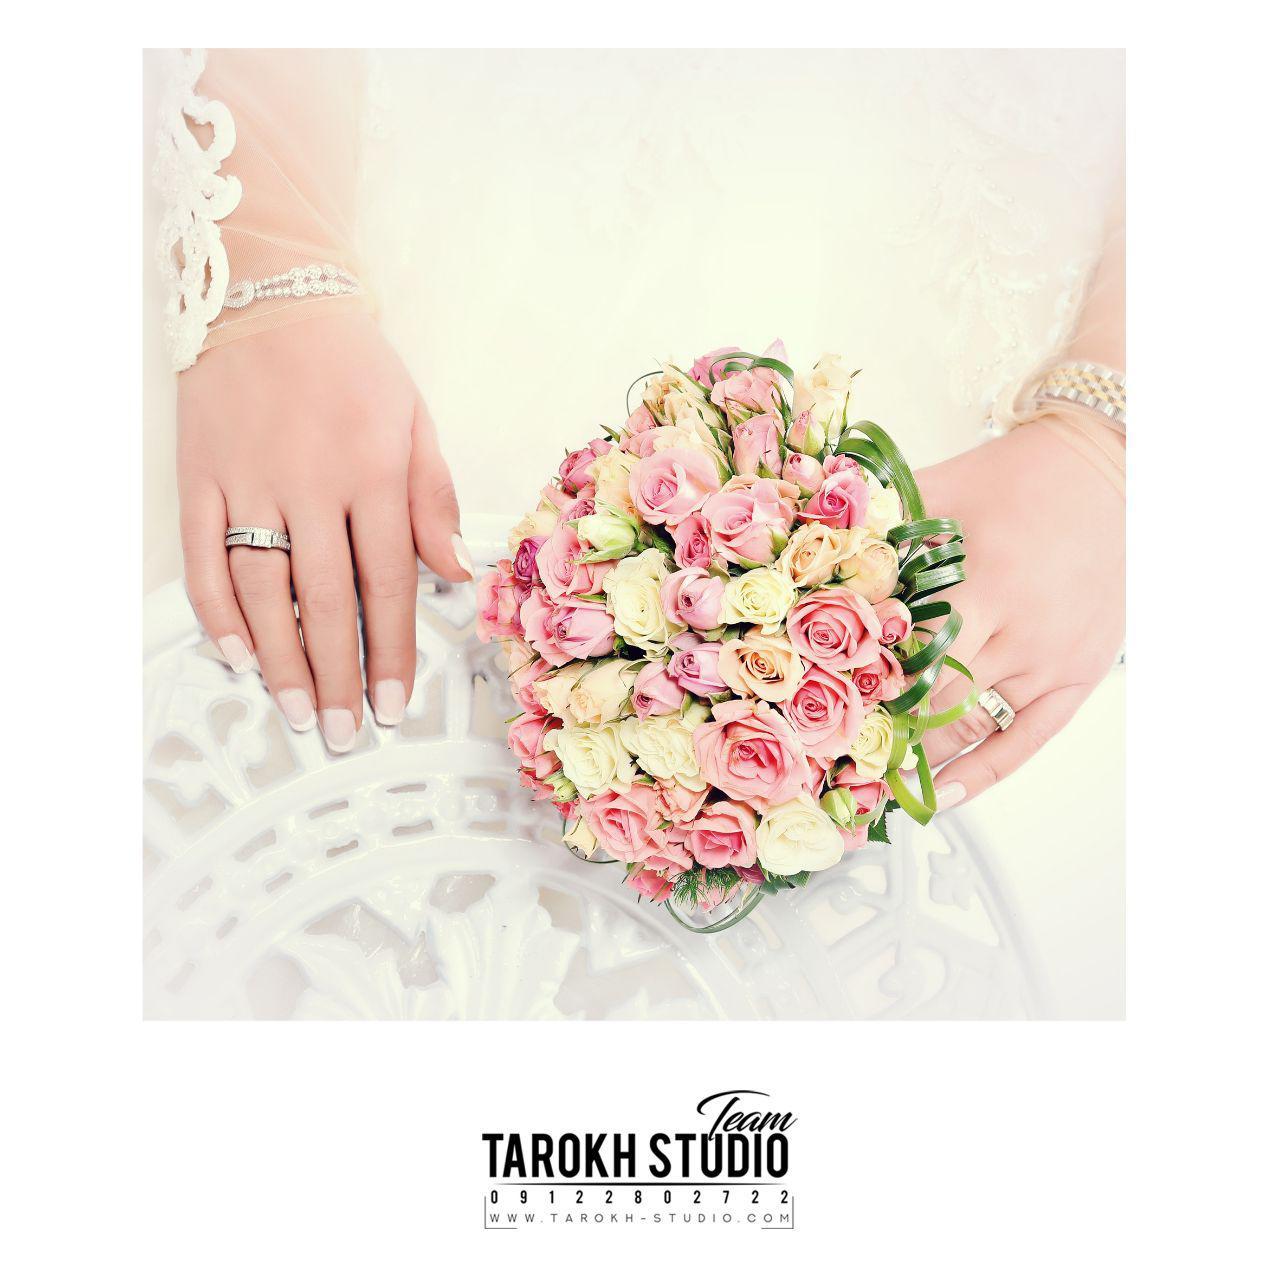 آتلیه عروس تارخ غرب تهران